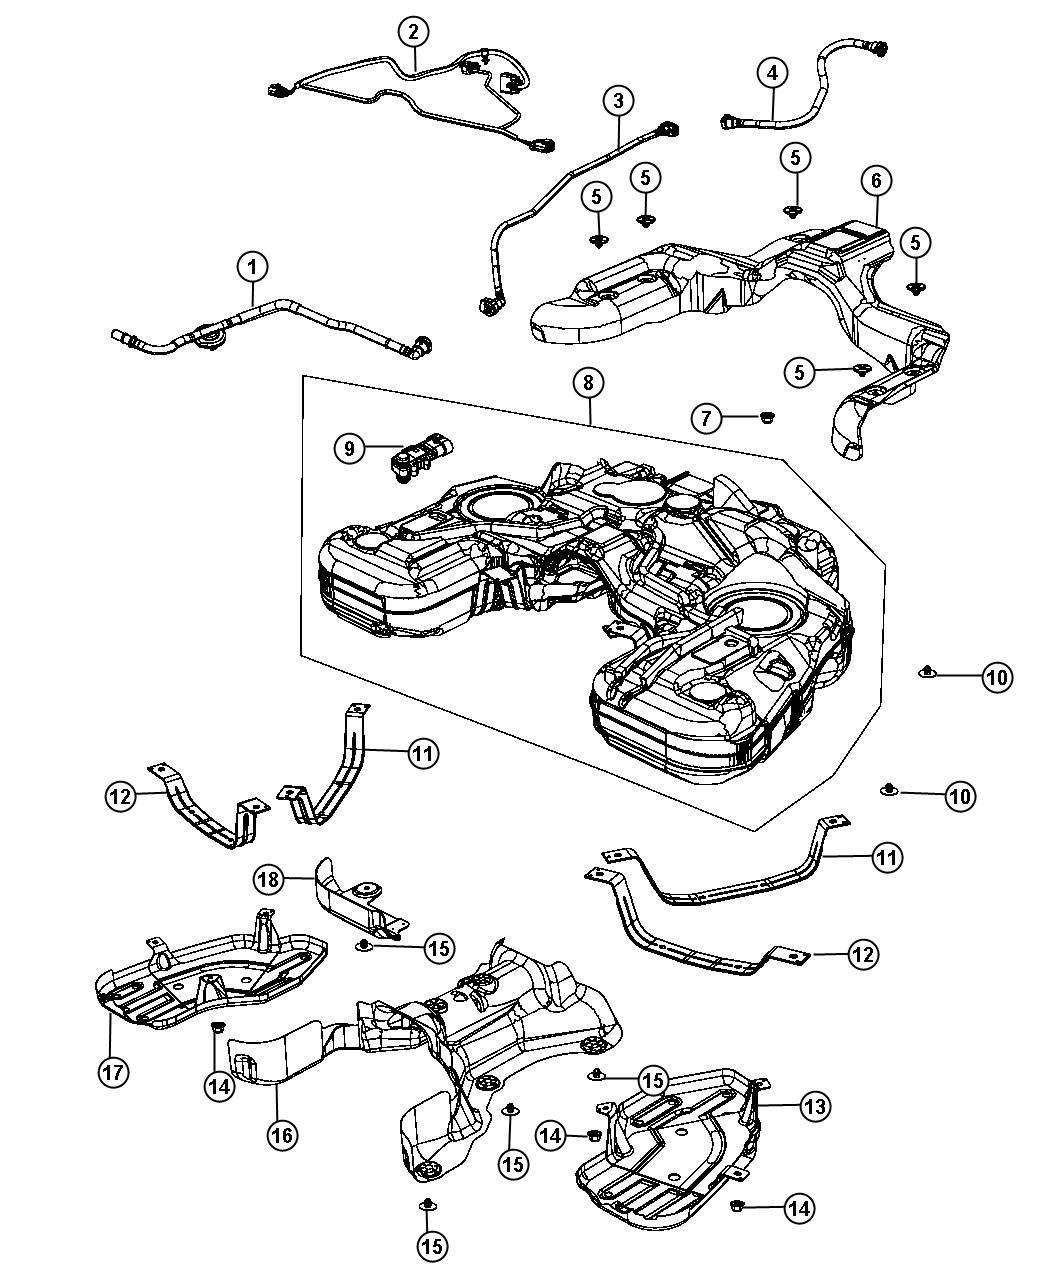 2015 Dodge Durango Wiring. Fuel tank jumper. [nf4], [nf4